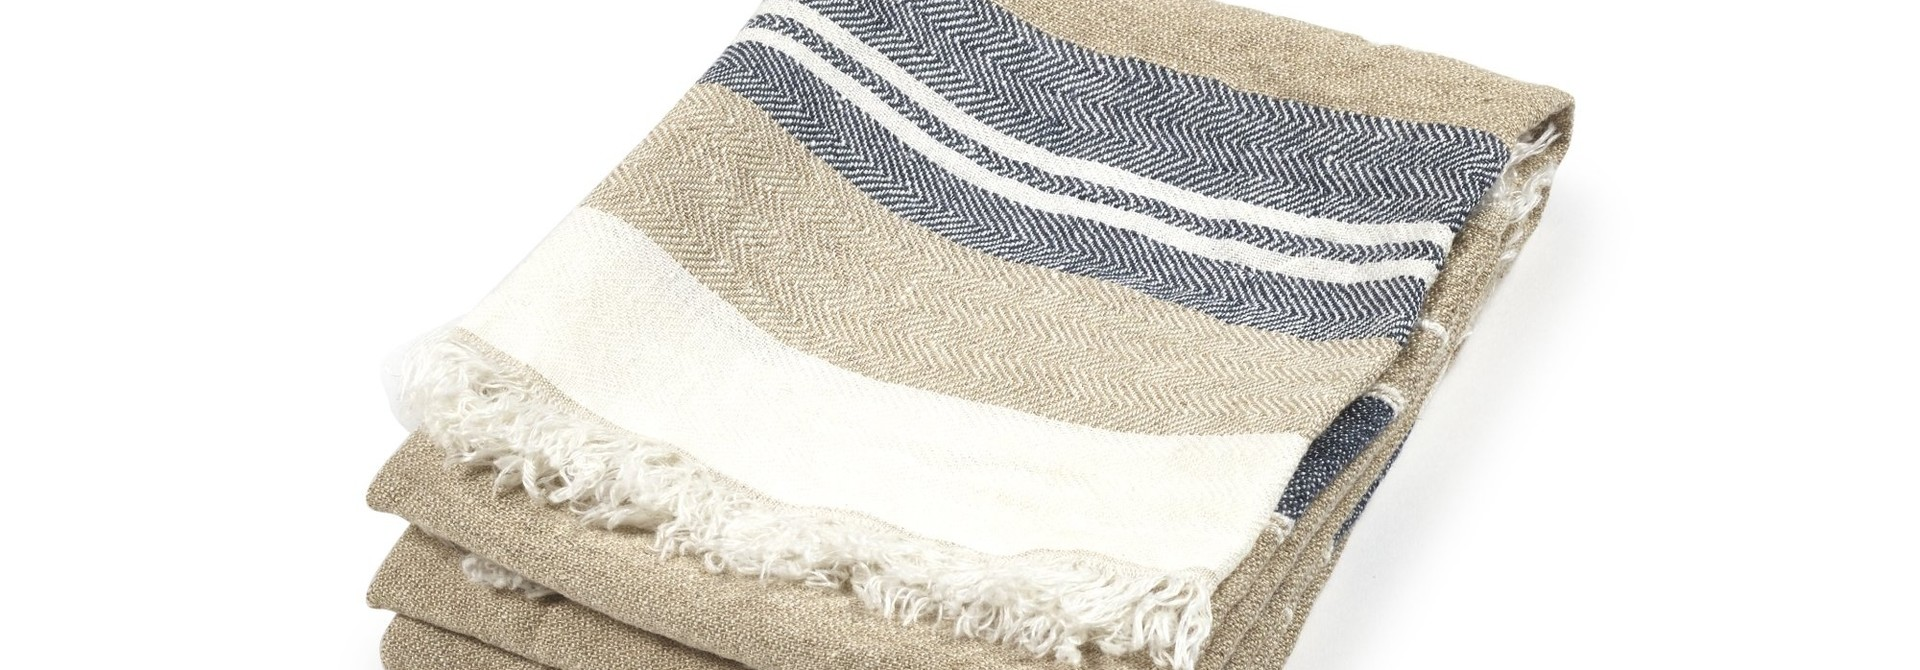 Bastion Stripe - Bath Towel